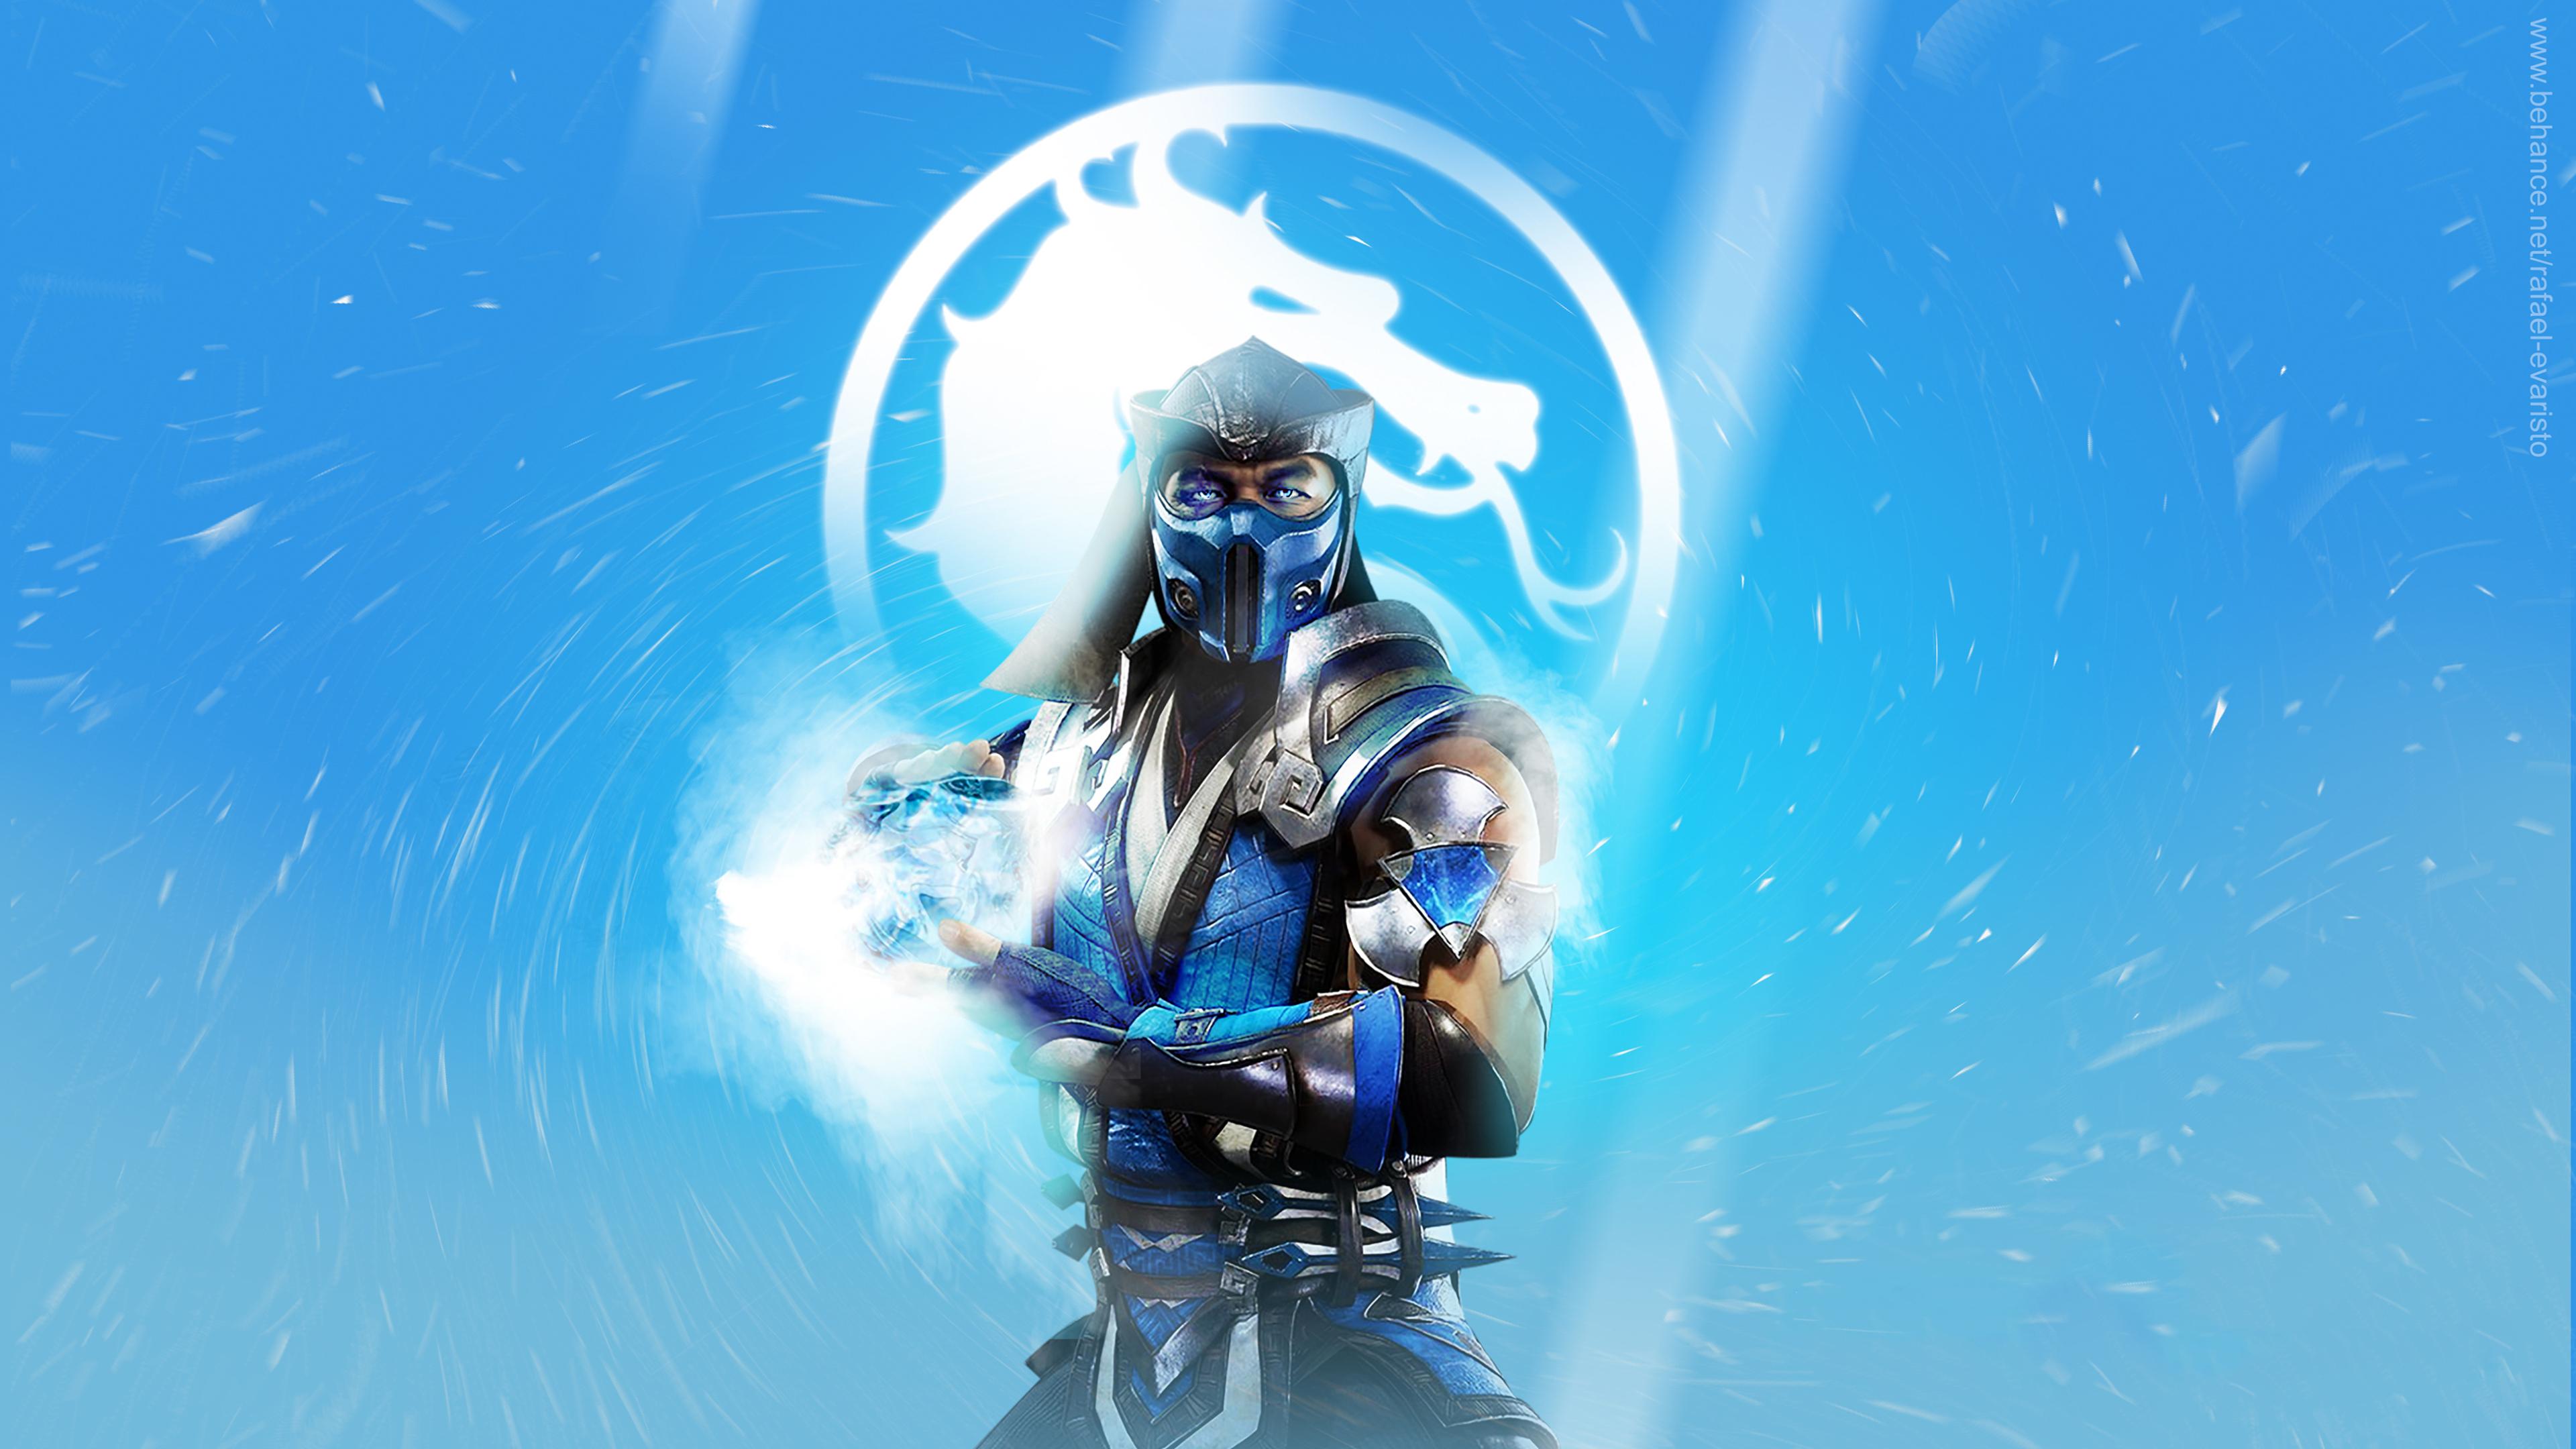 3840x2160 Sub Zero Mortal Kombat 11 4k Wallpaper Hd Games 4k